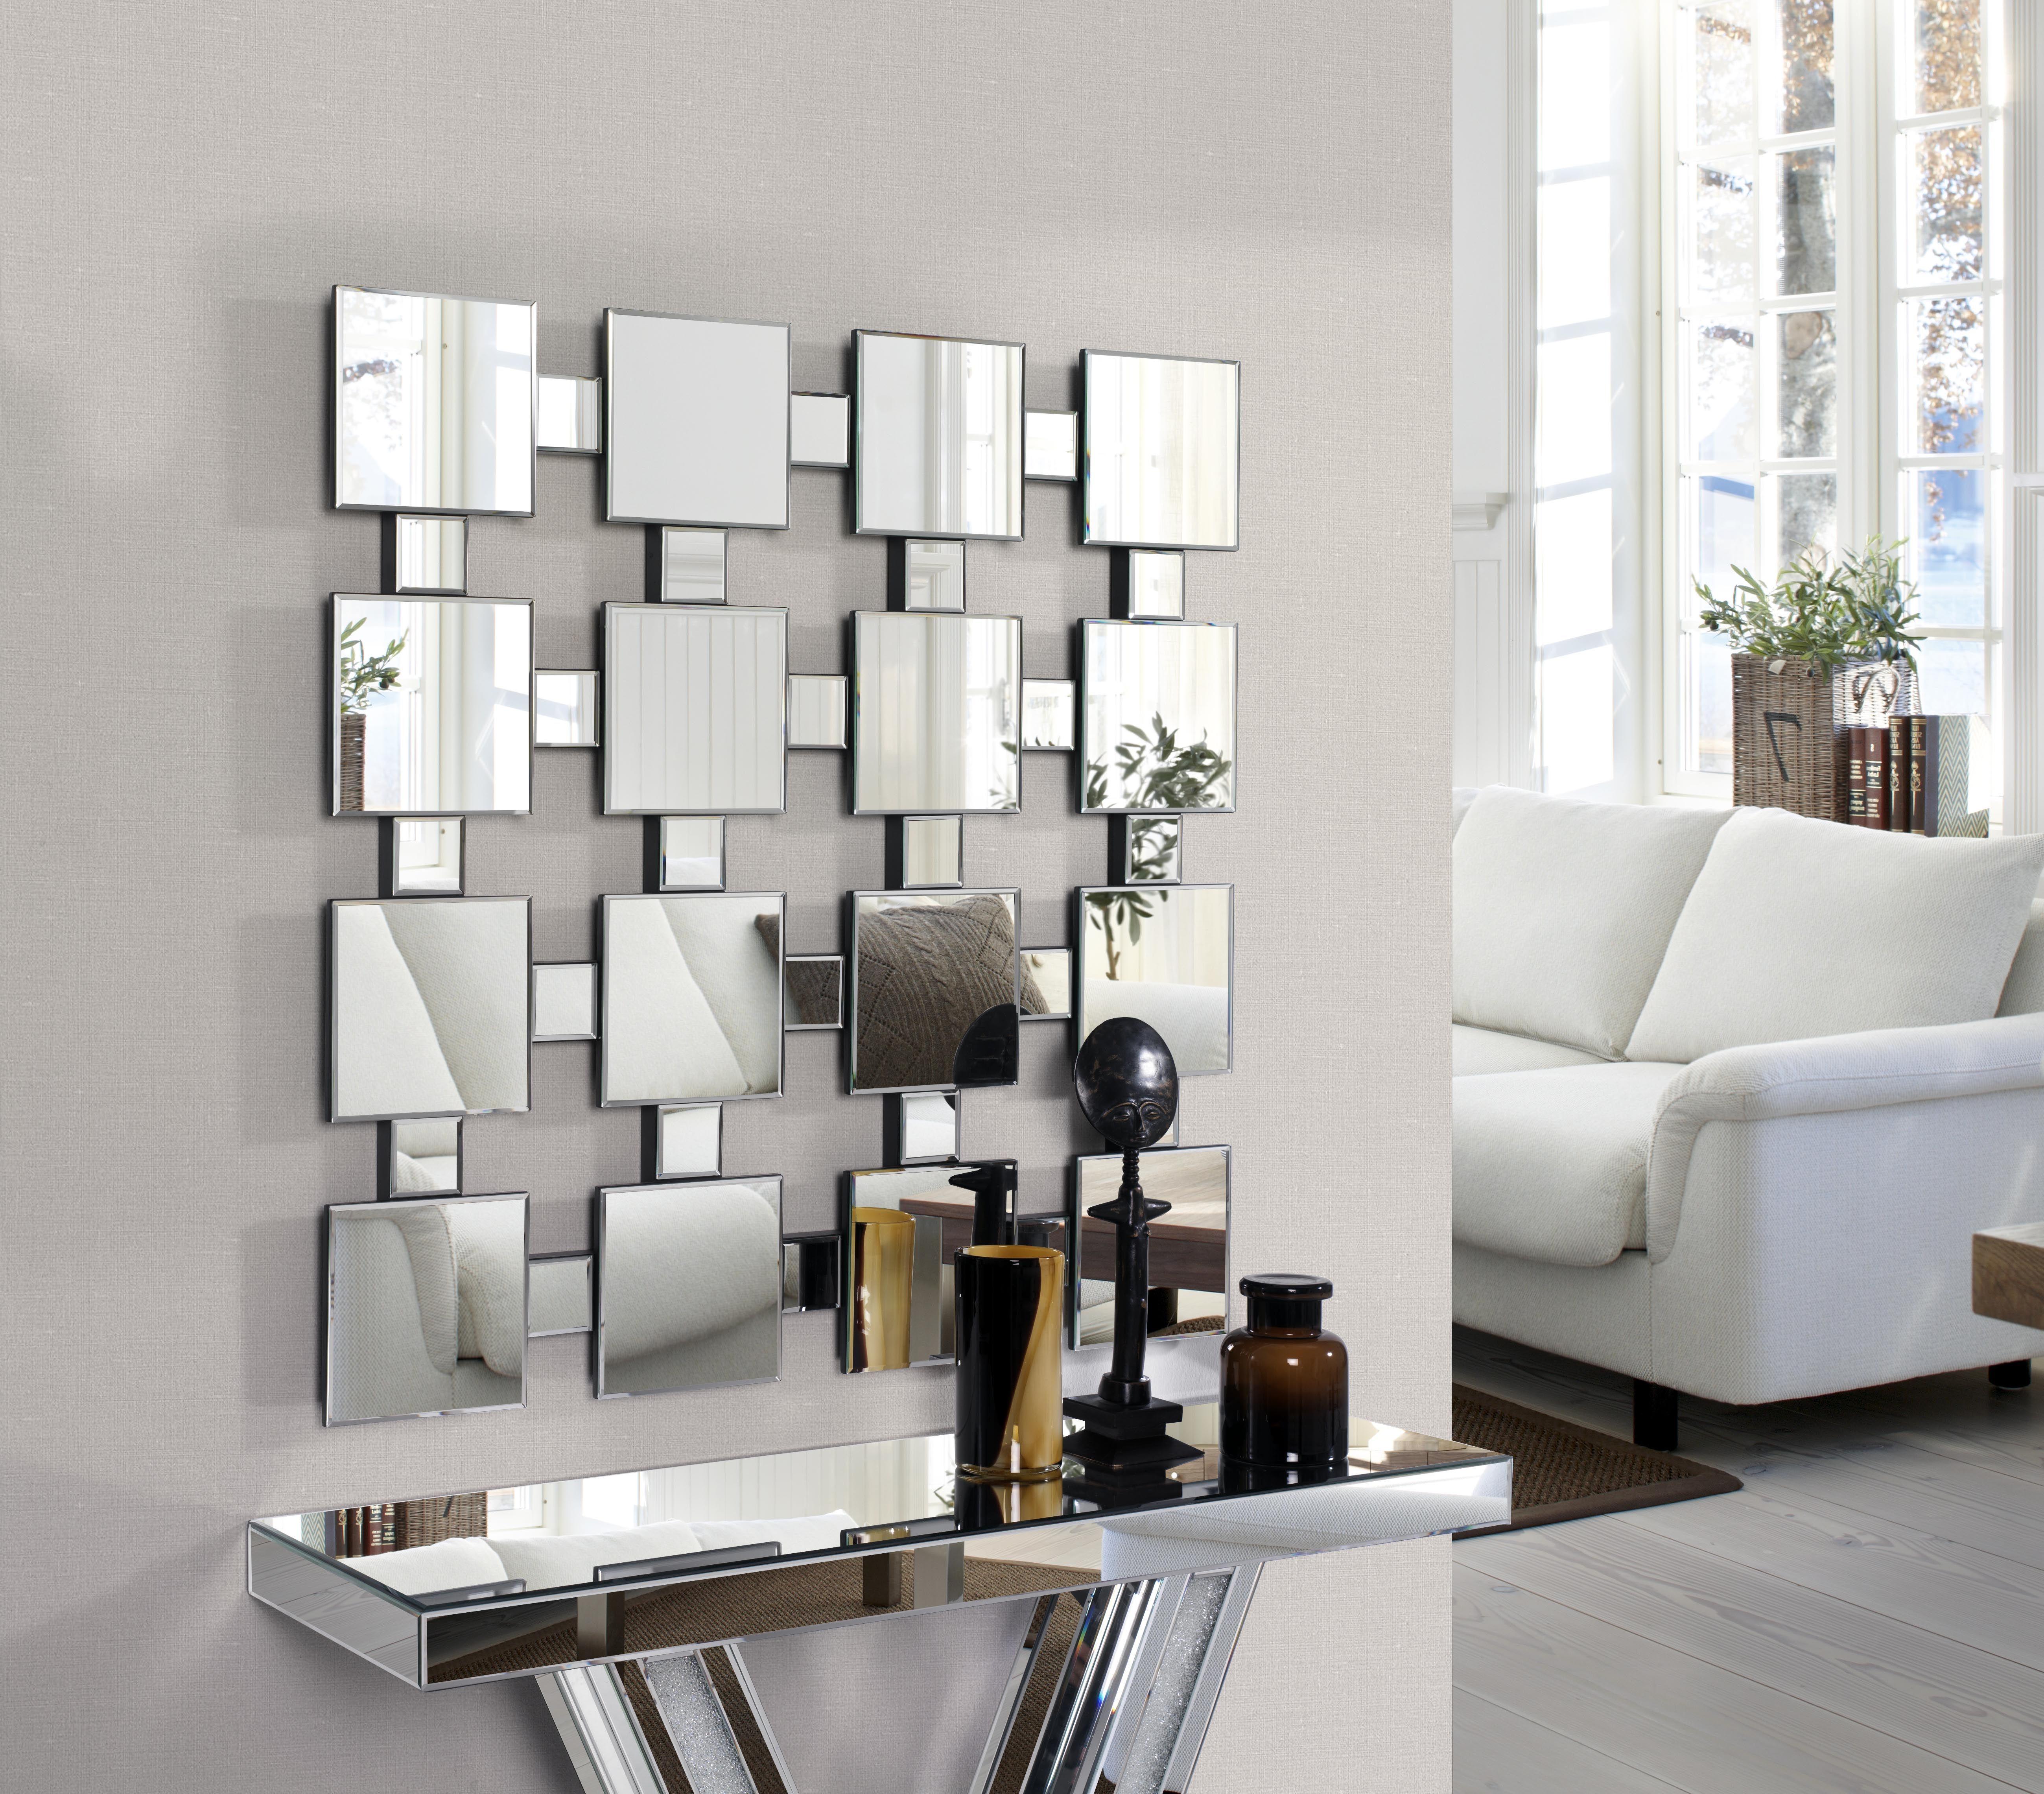 Ofertas espejos de dise o rebajados for Espejos decorativos cuadrados